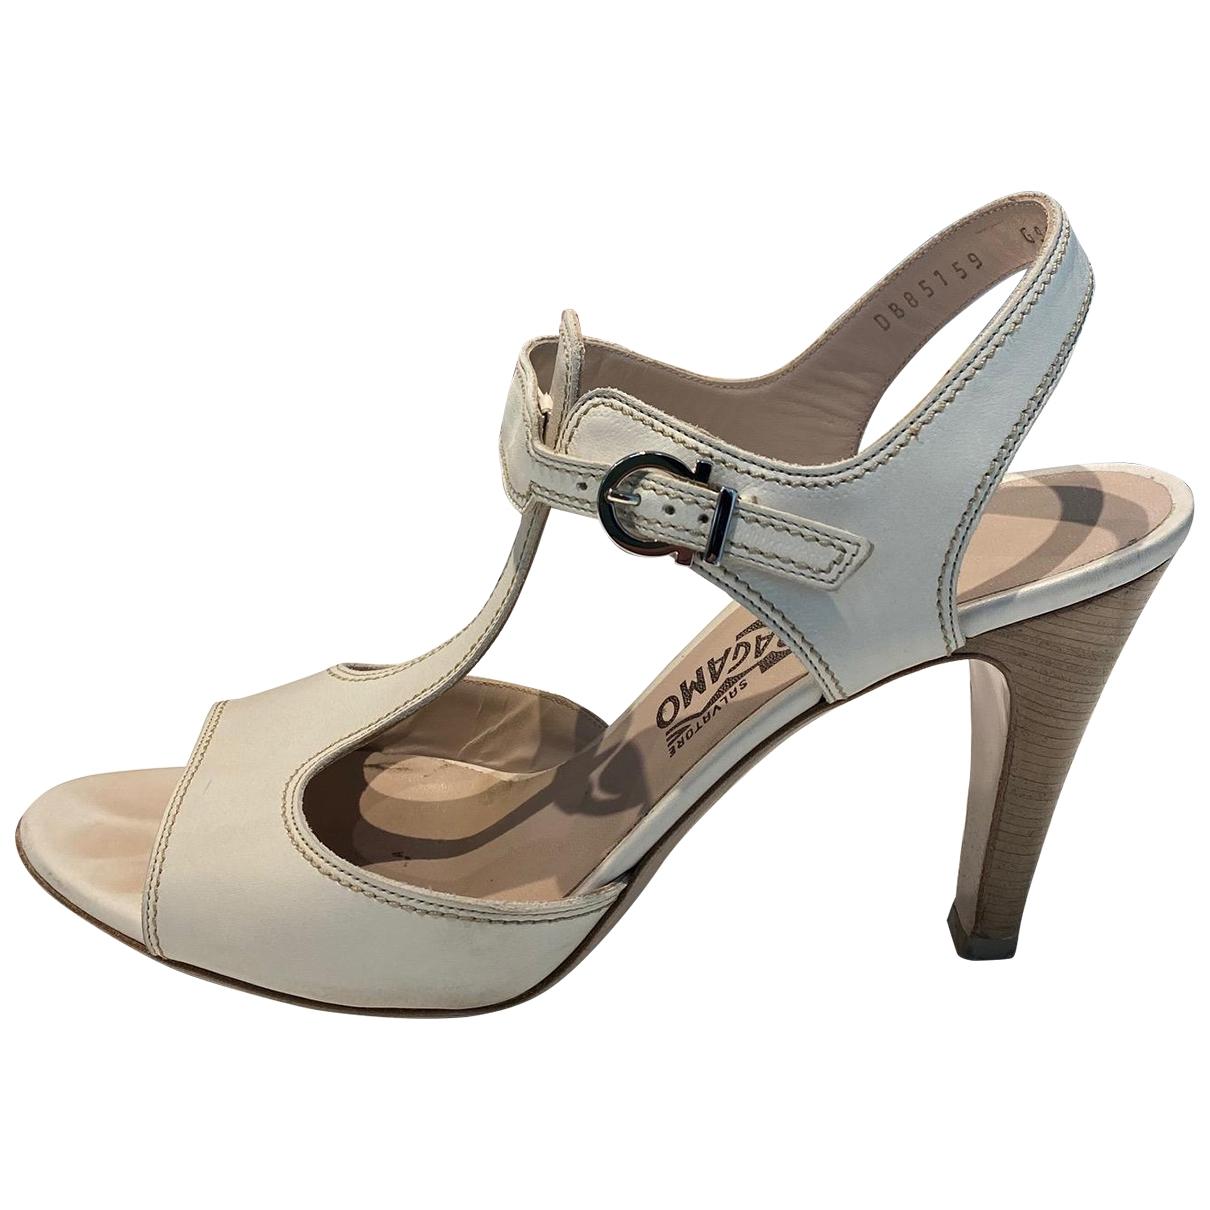 Salvatore Ferragamo \N Beige Leather Sandals for Women 40 IT